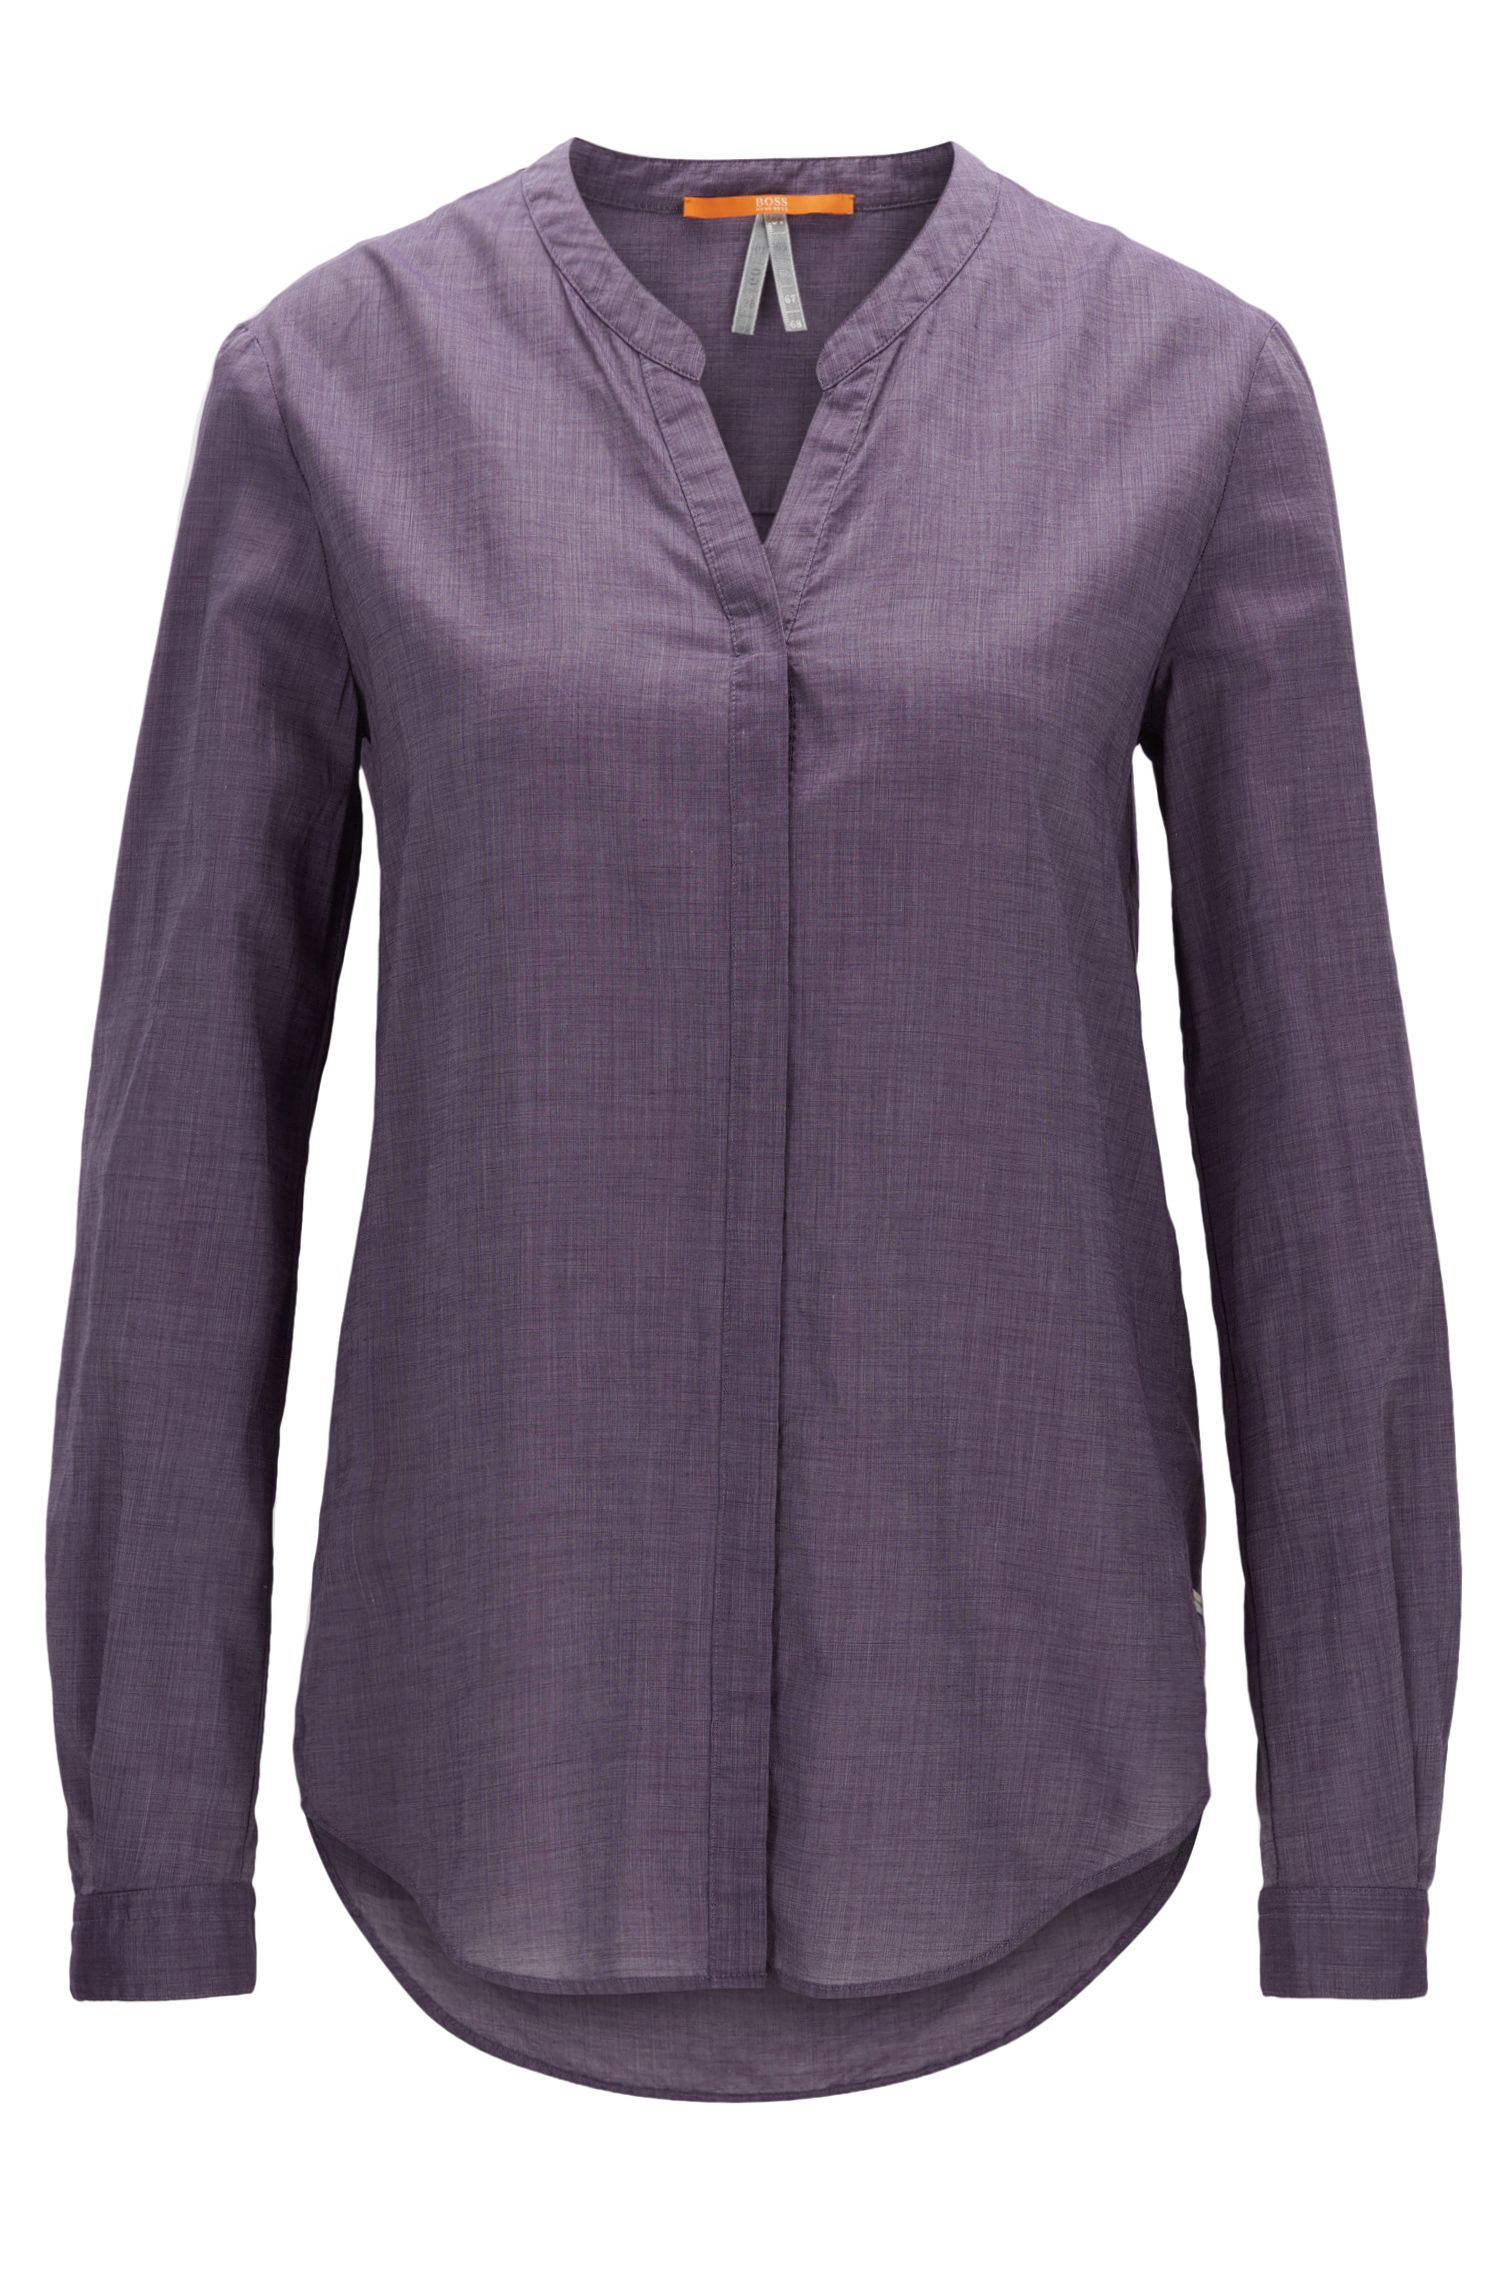 Relaxed-Fit Bluse aus leichtem Baumwoll-Mix